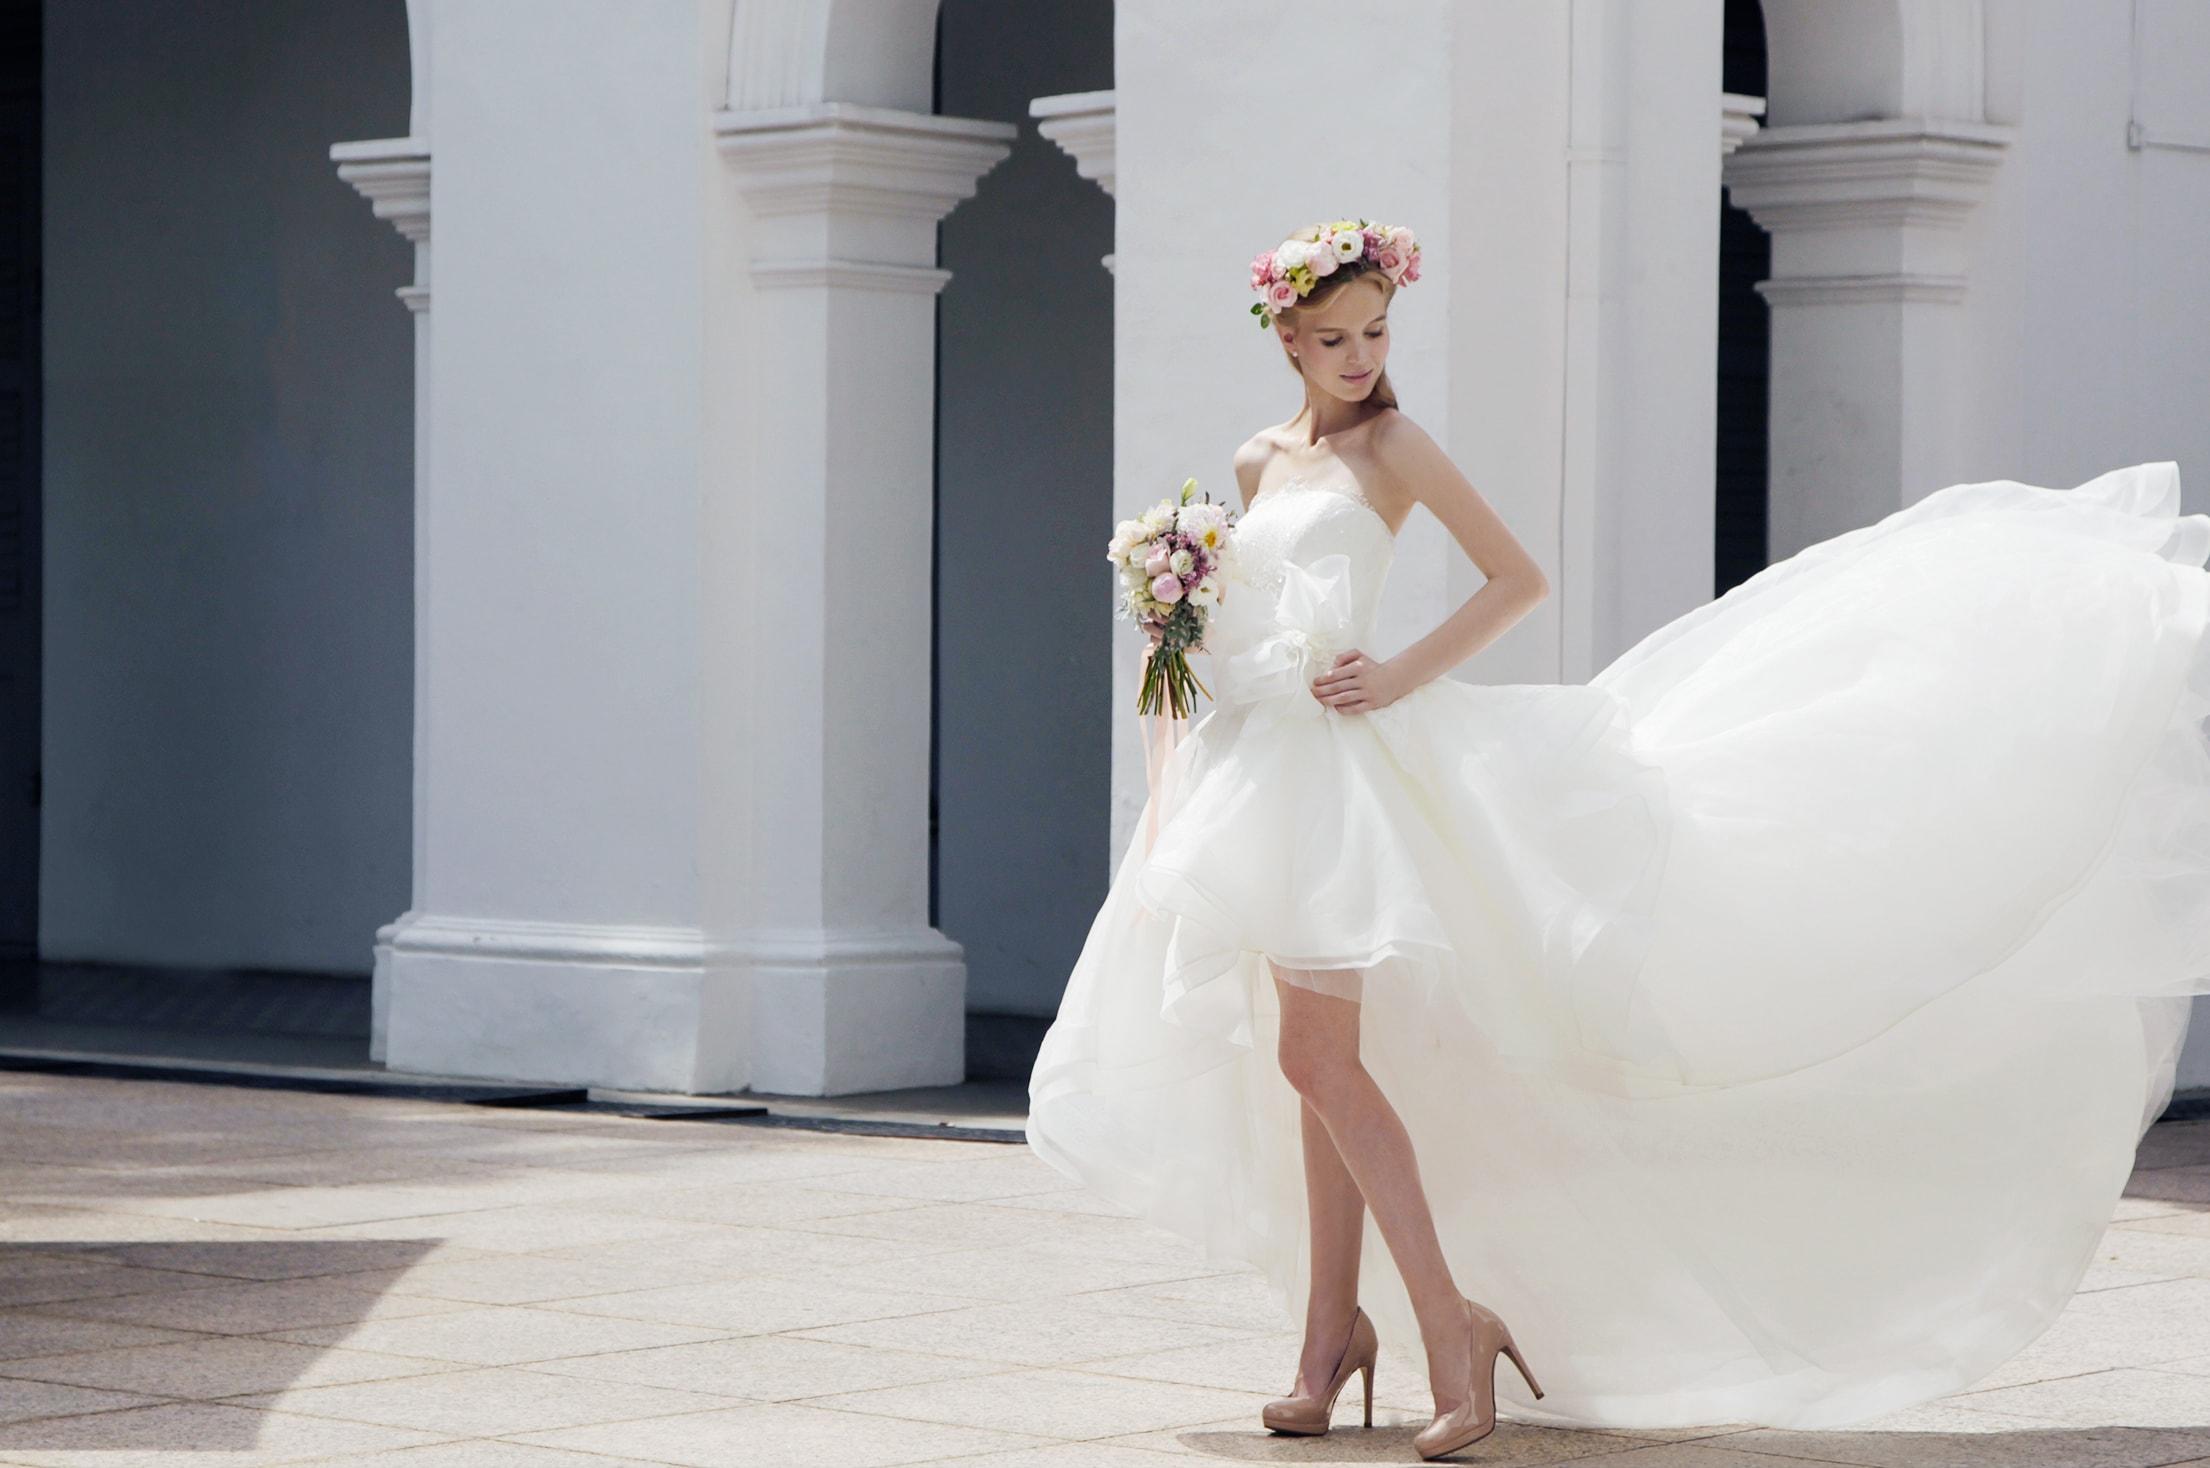 06-Z-Wedding-Engagement-Asymmetrical-Organza-Dress